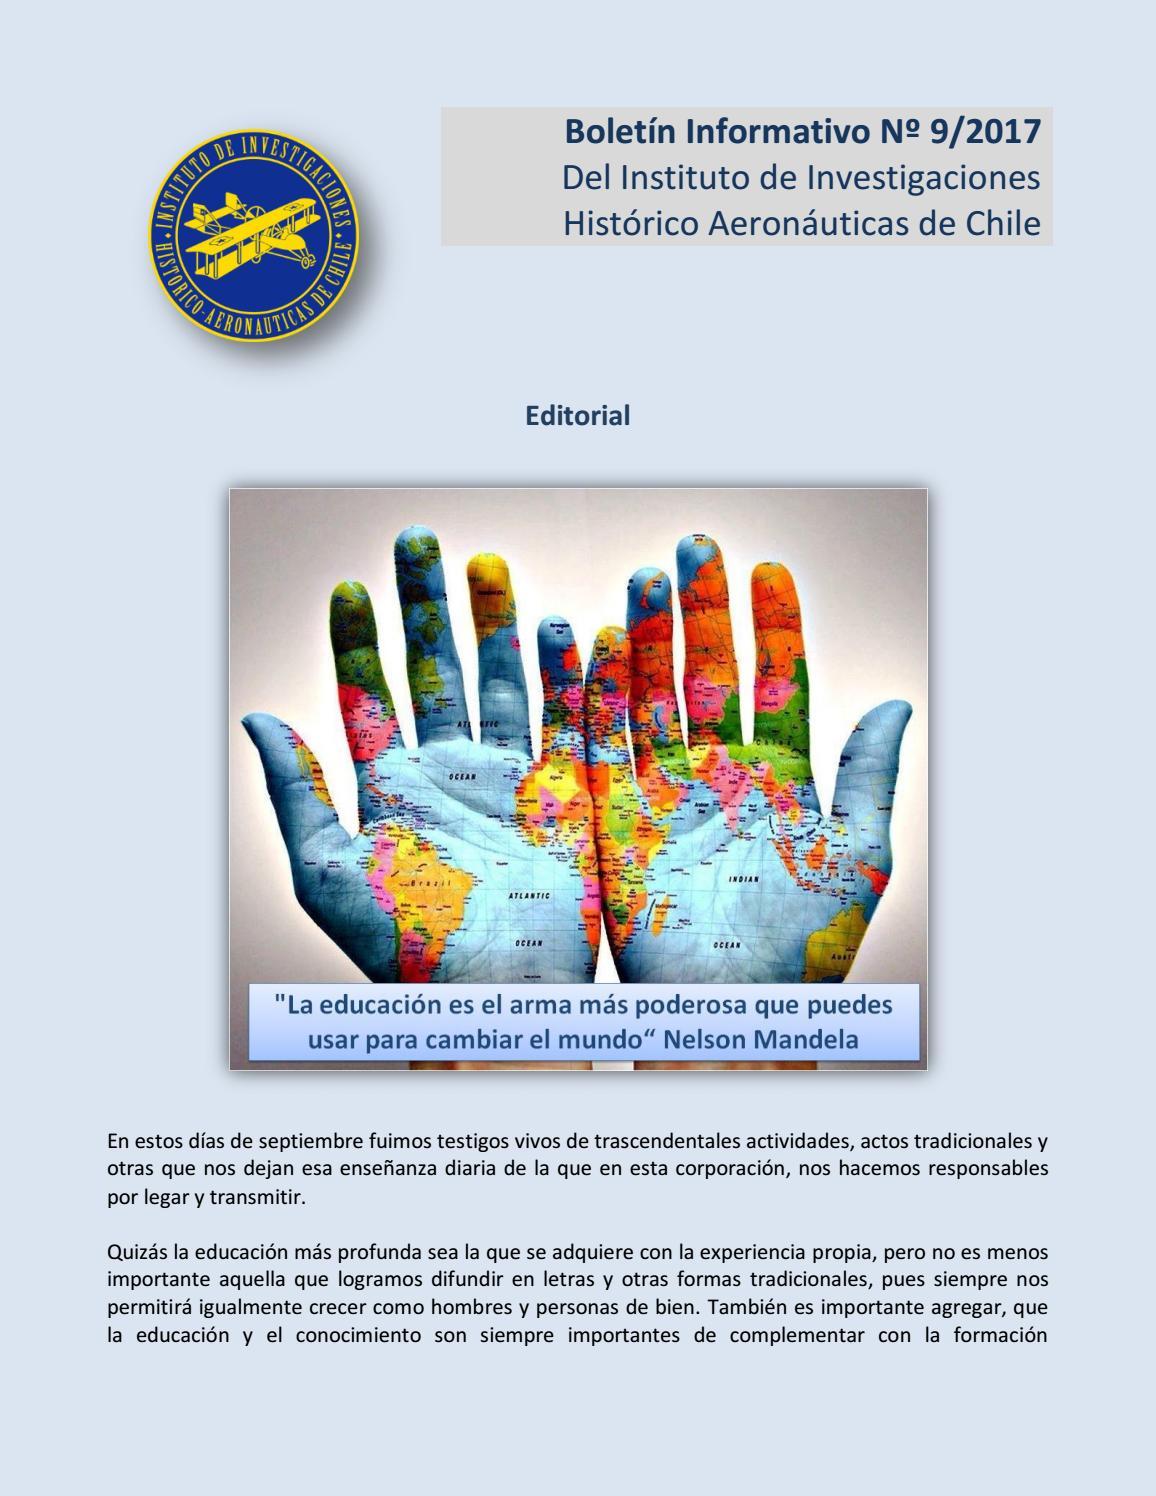 Boletín informativo IIHACH Nº9 2017 by Norberto Traub - issuu